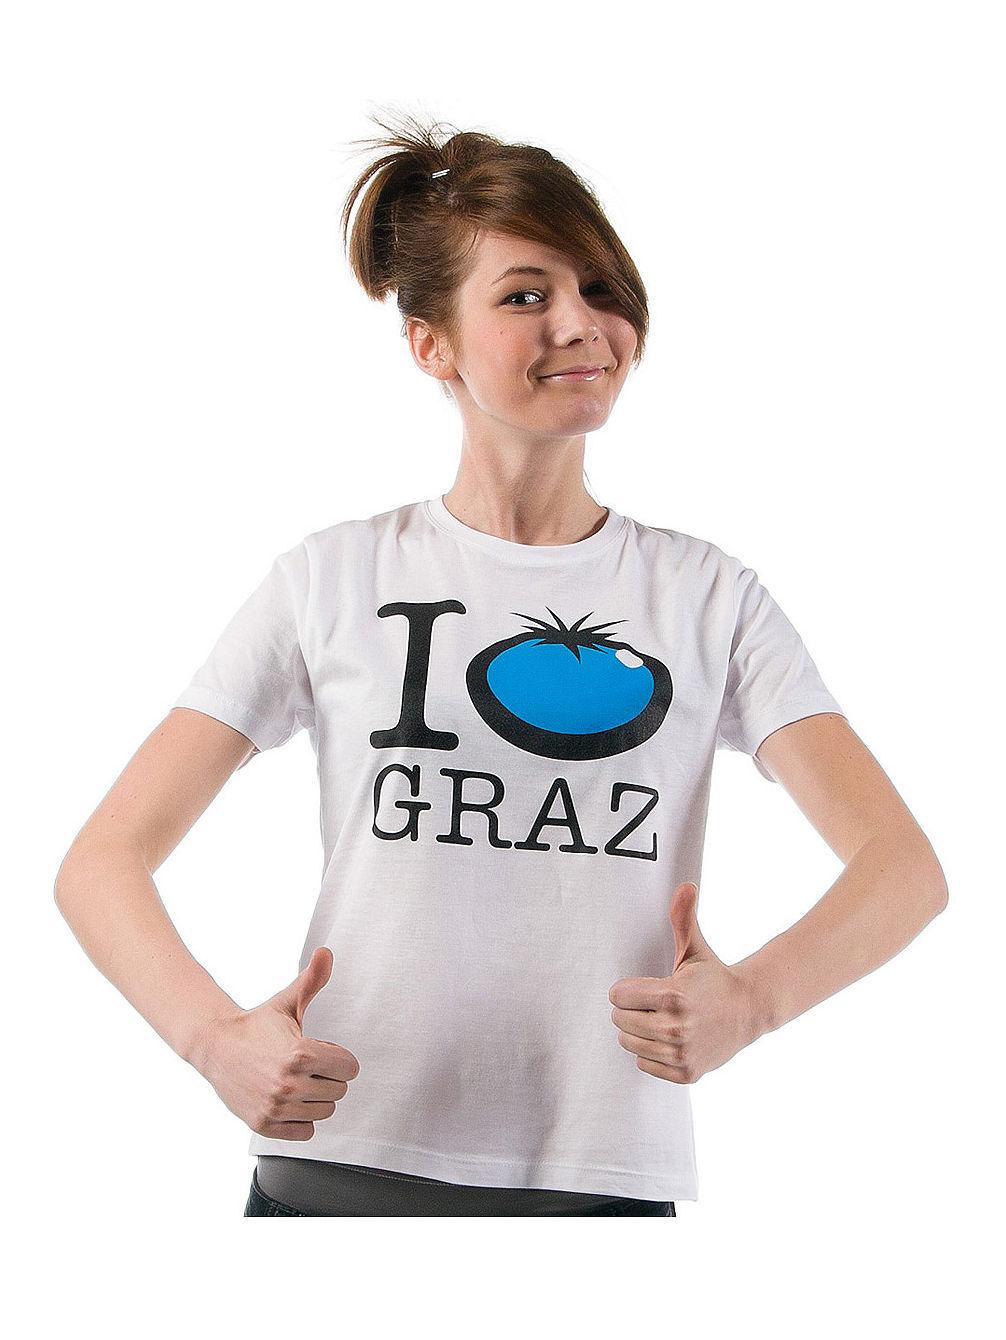 graz women Austria - dfc luv graz - results, fixtures, squad, statistics, photos, videos and  news - women soccerway.